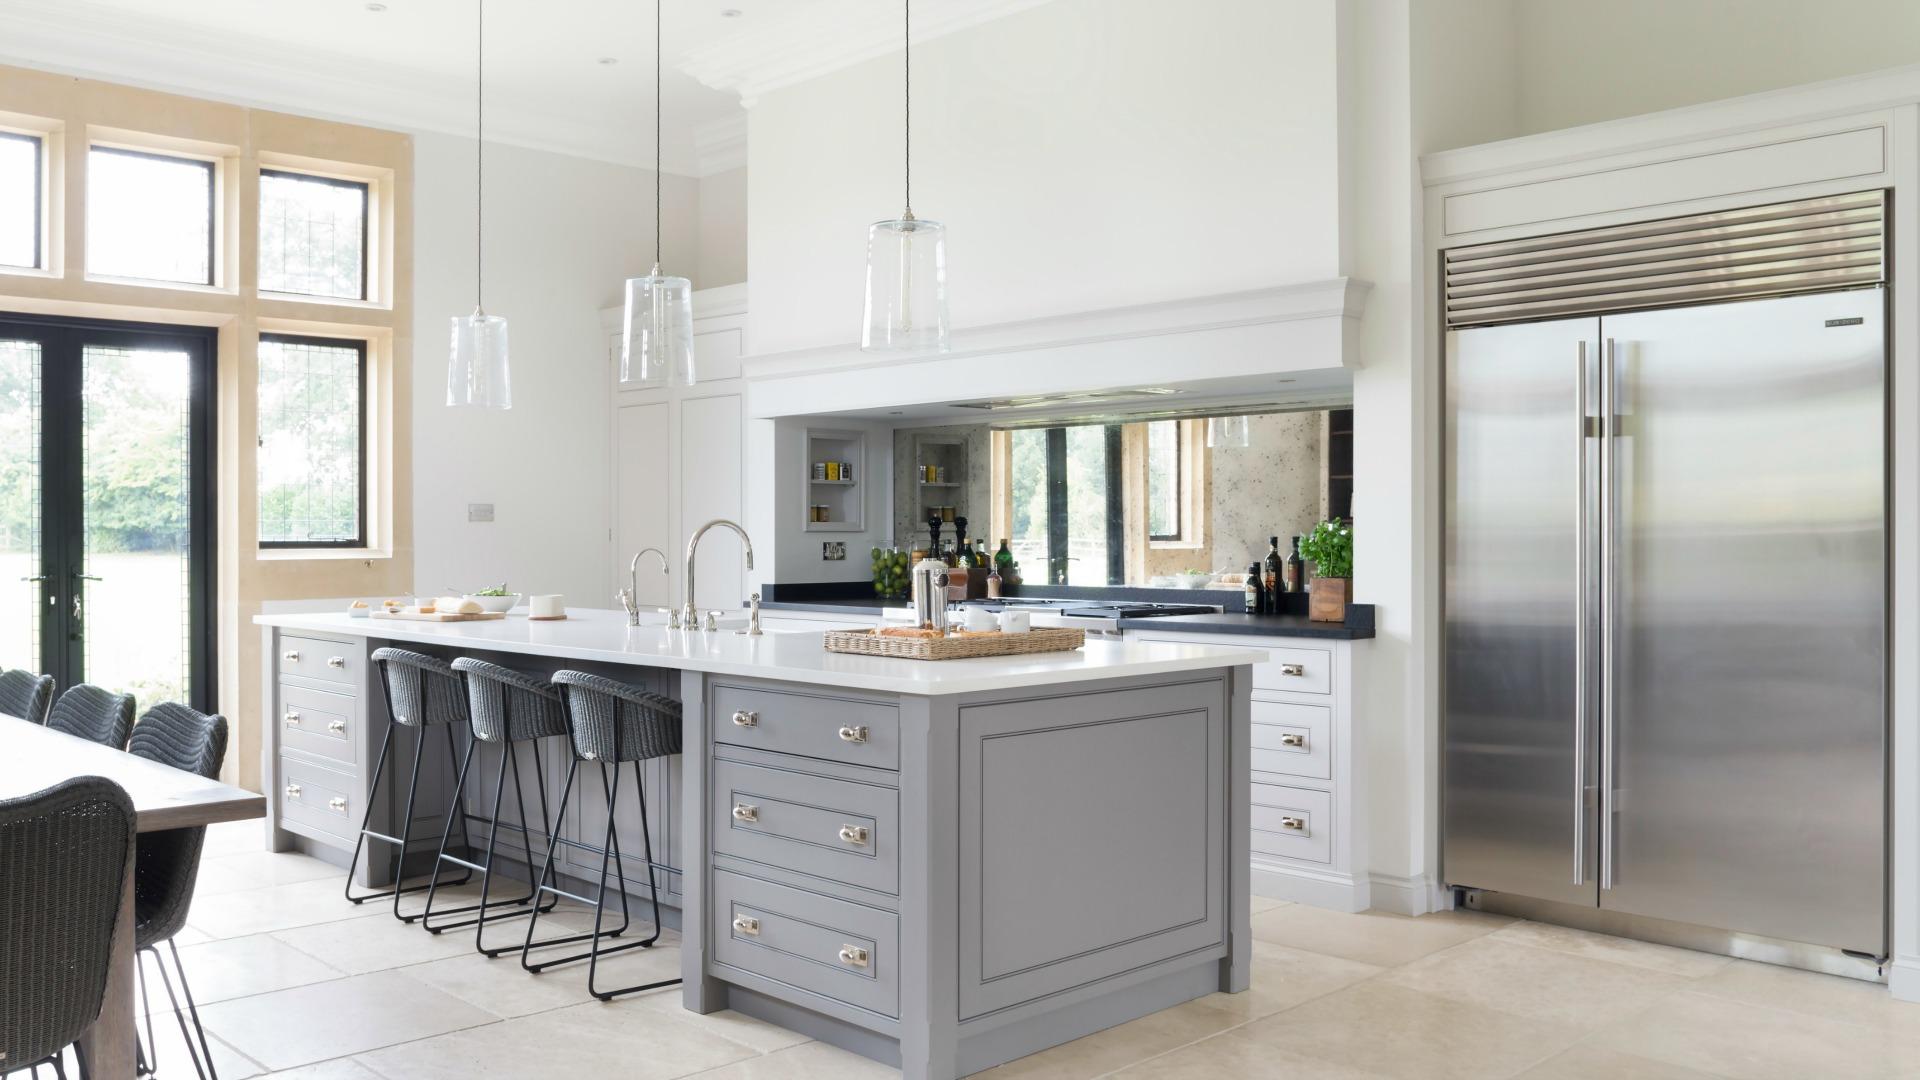 Sub-Zero and Wolf - Humphrey Munson - Hertfordshire - Essex - fridge freezer